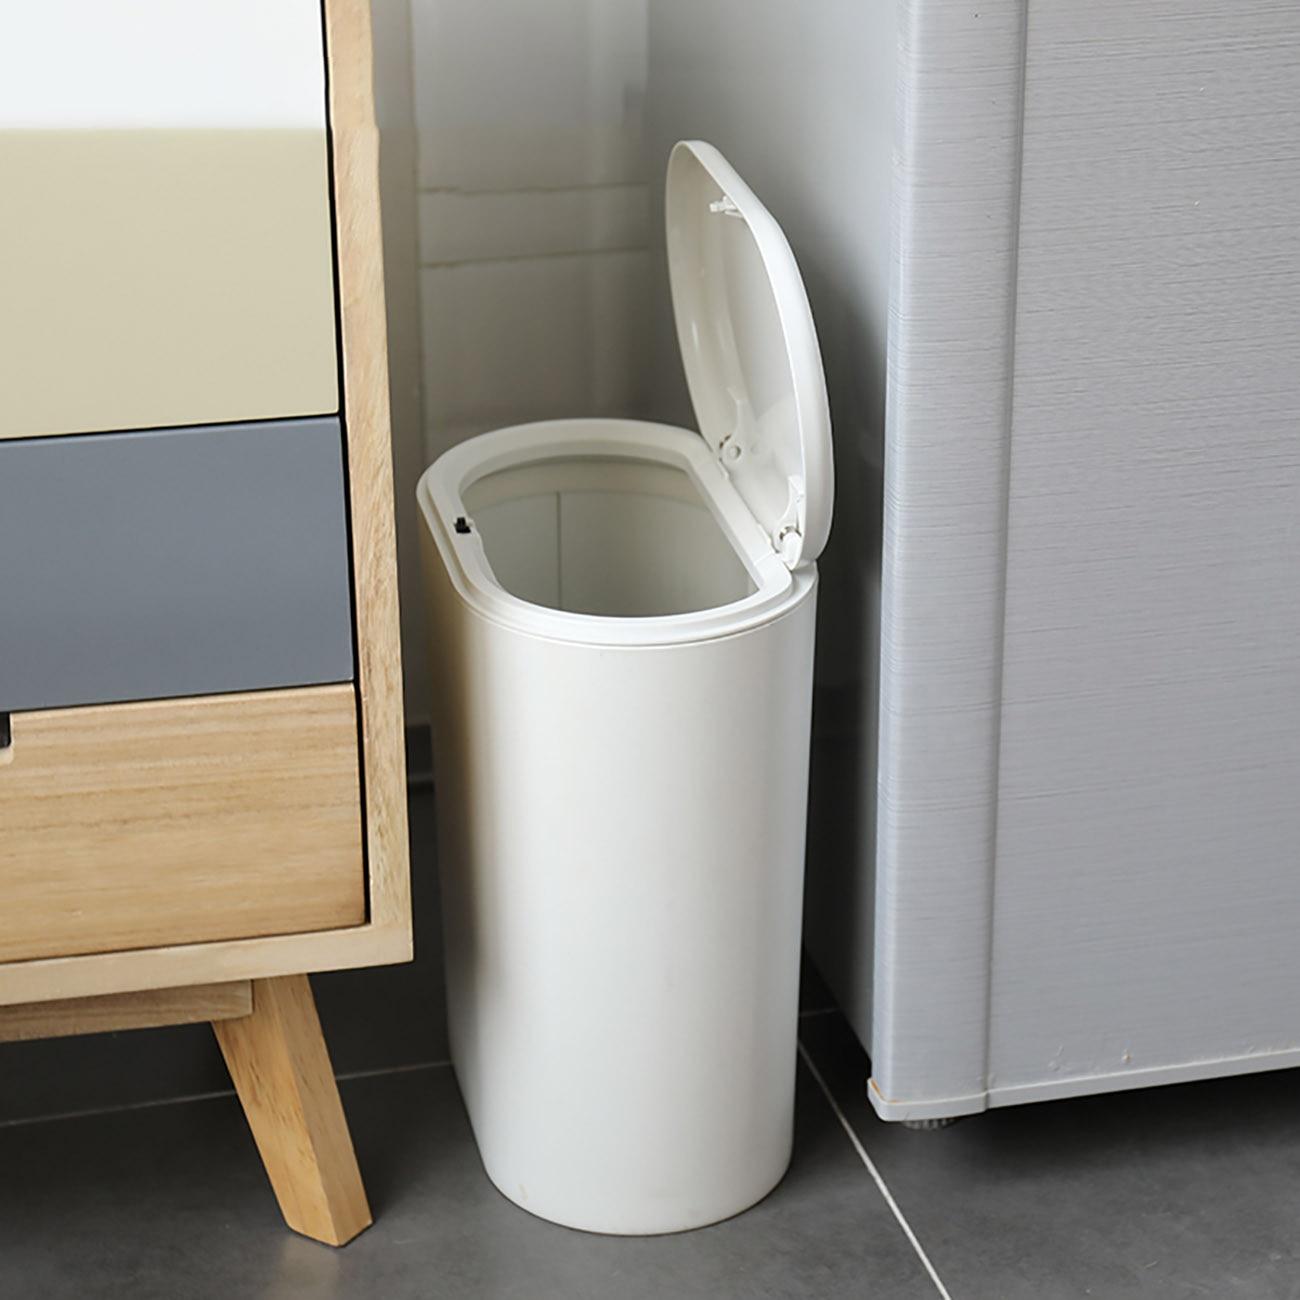 Plastic Oval Trash Can Pressing Type Trash Bin Dustbin Wastebasket Kitchen Bathroom Garbage Storage Bin Can Waste Bins Aliexpress